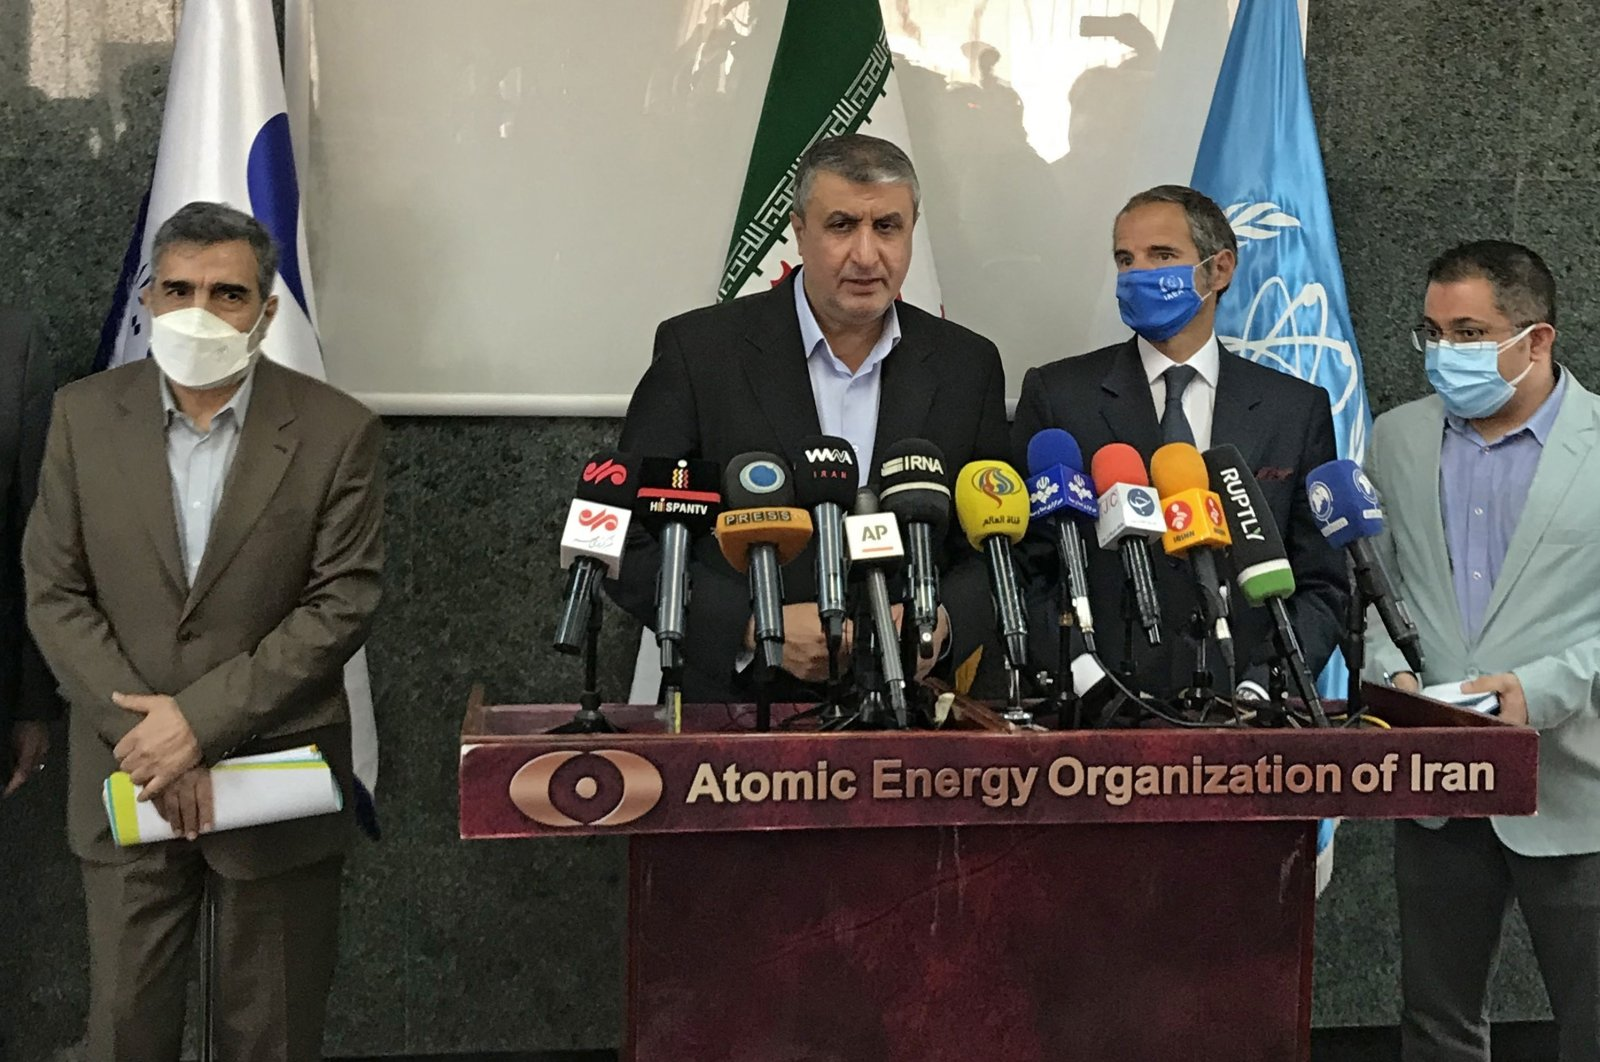 Atomic Energy Organization of Iran (AEOI) head Mohammad Eslami (C) delivers a speech next to Director General of the International Atomic Energy Agency (IAEA) Rafael Grossi (2-R) and AEOI spokesperson Behrouz Kamalvandi in Tehran, Iran, Sept. 12, 2021. (AEOI handout photo via AFP)